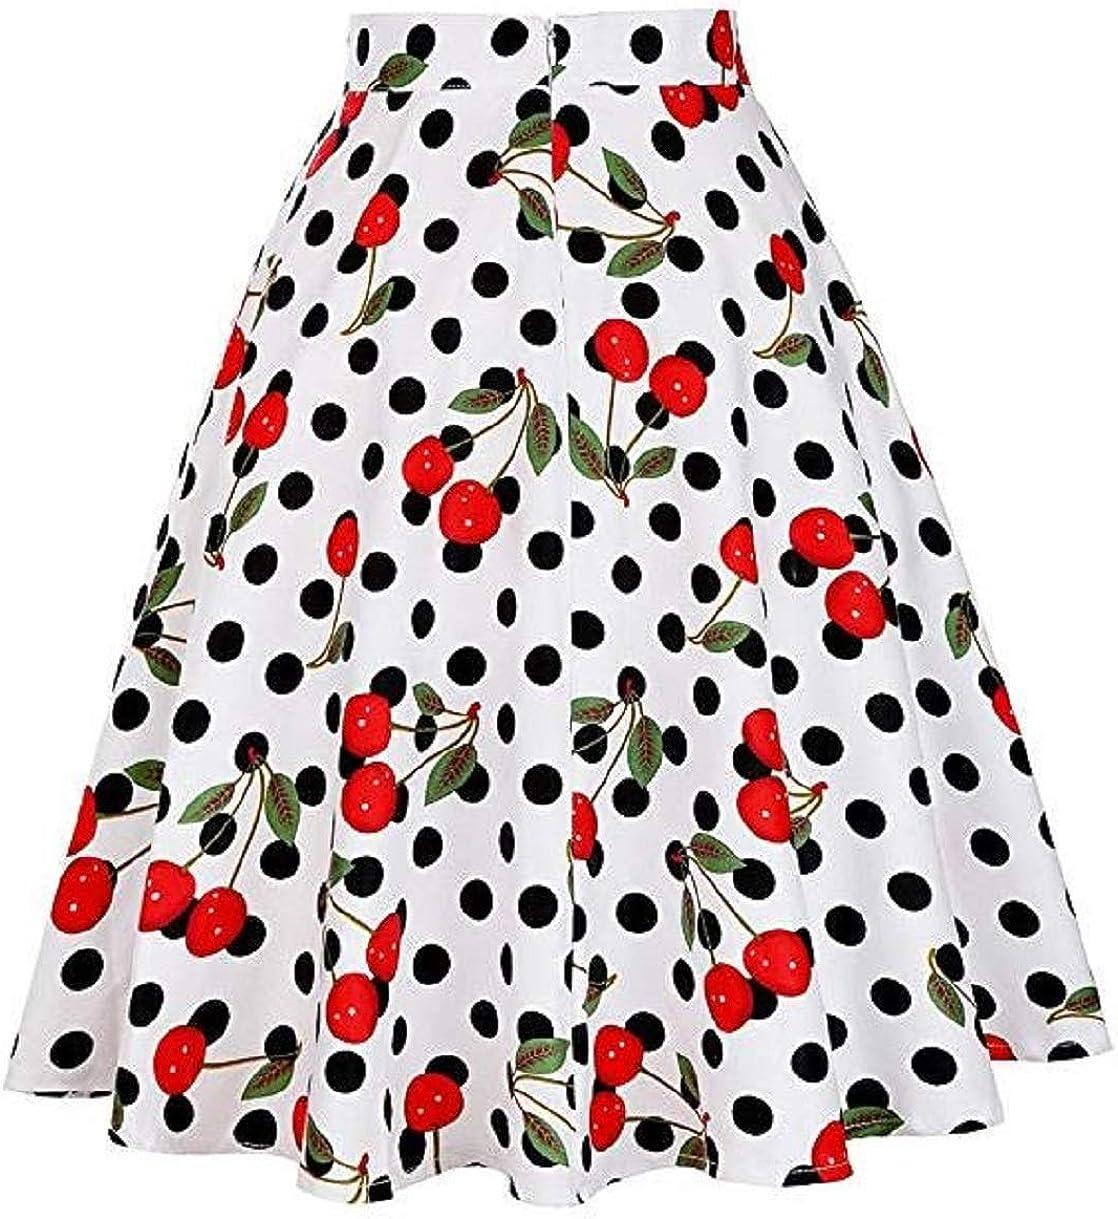 Women Pleated High Waist Skirts Skirt Casual Polka Dot Floral Print Vintage Skirts